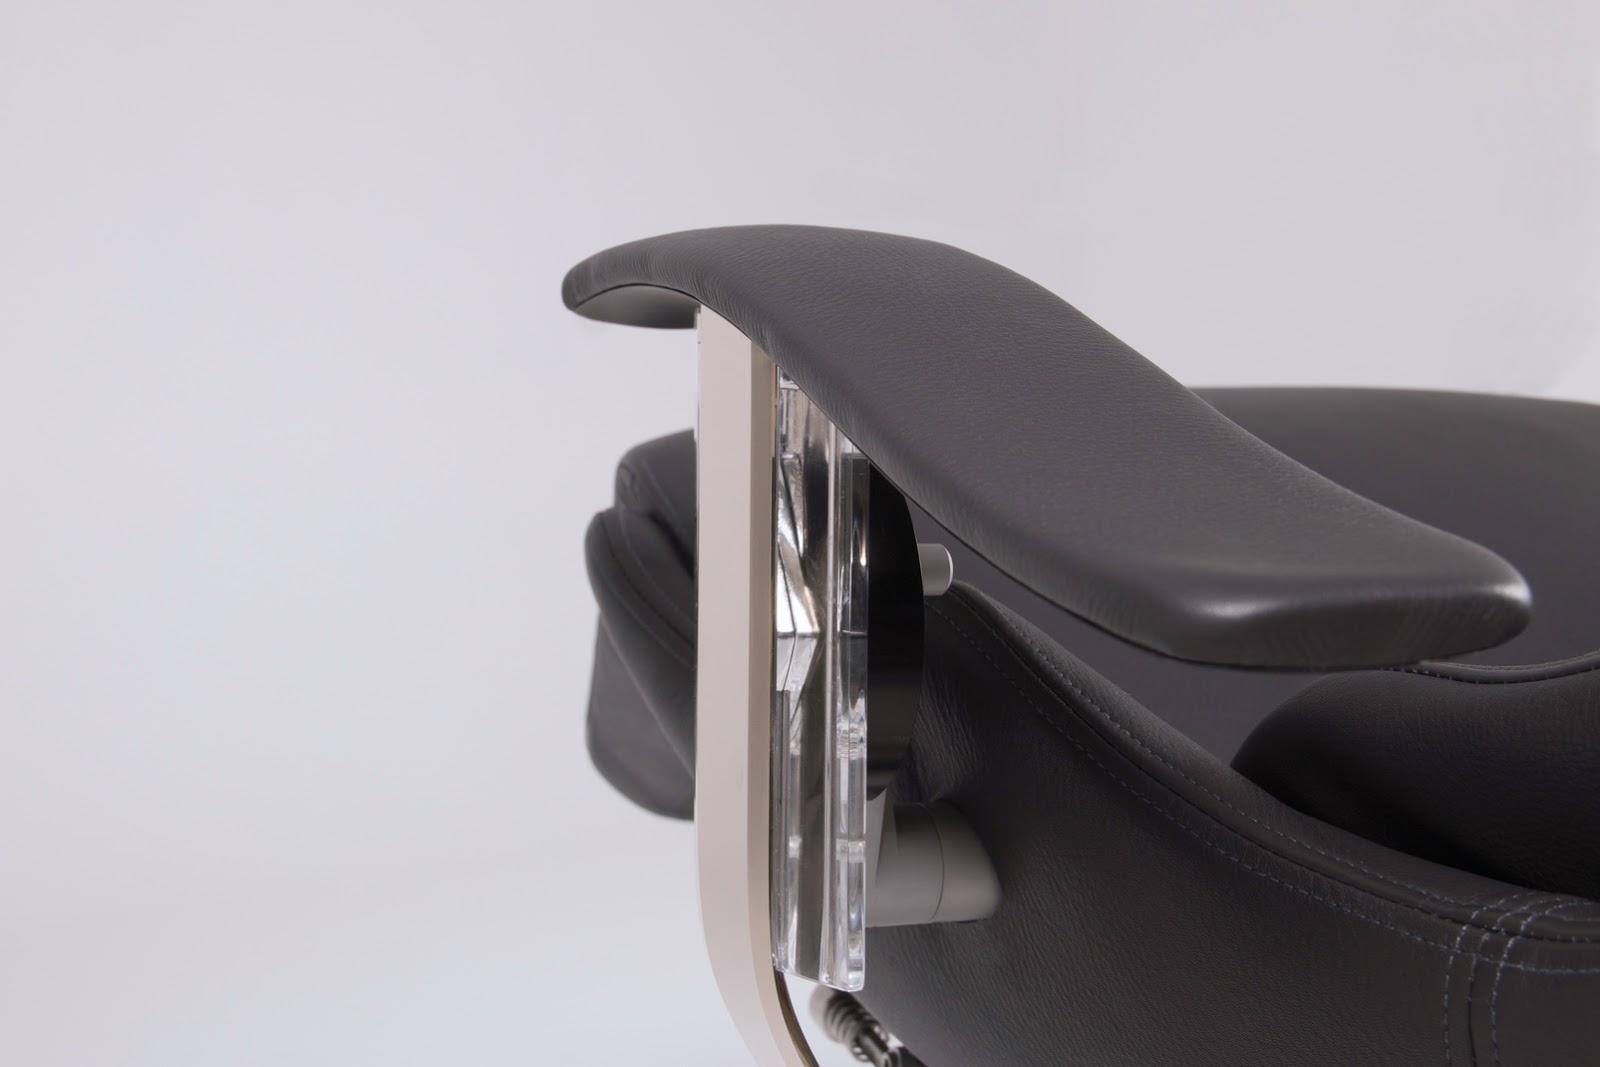 rolls-elysium-r-advanced-seat-11